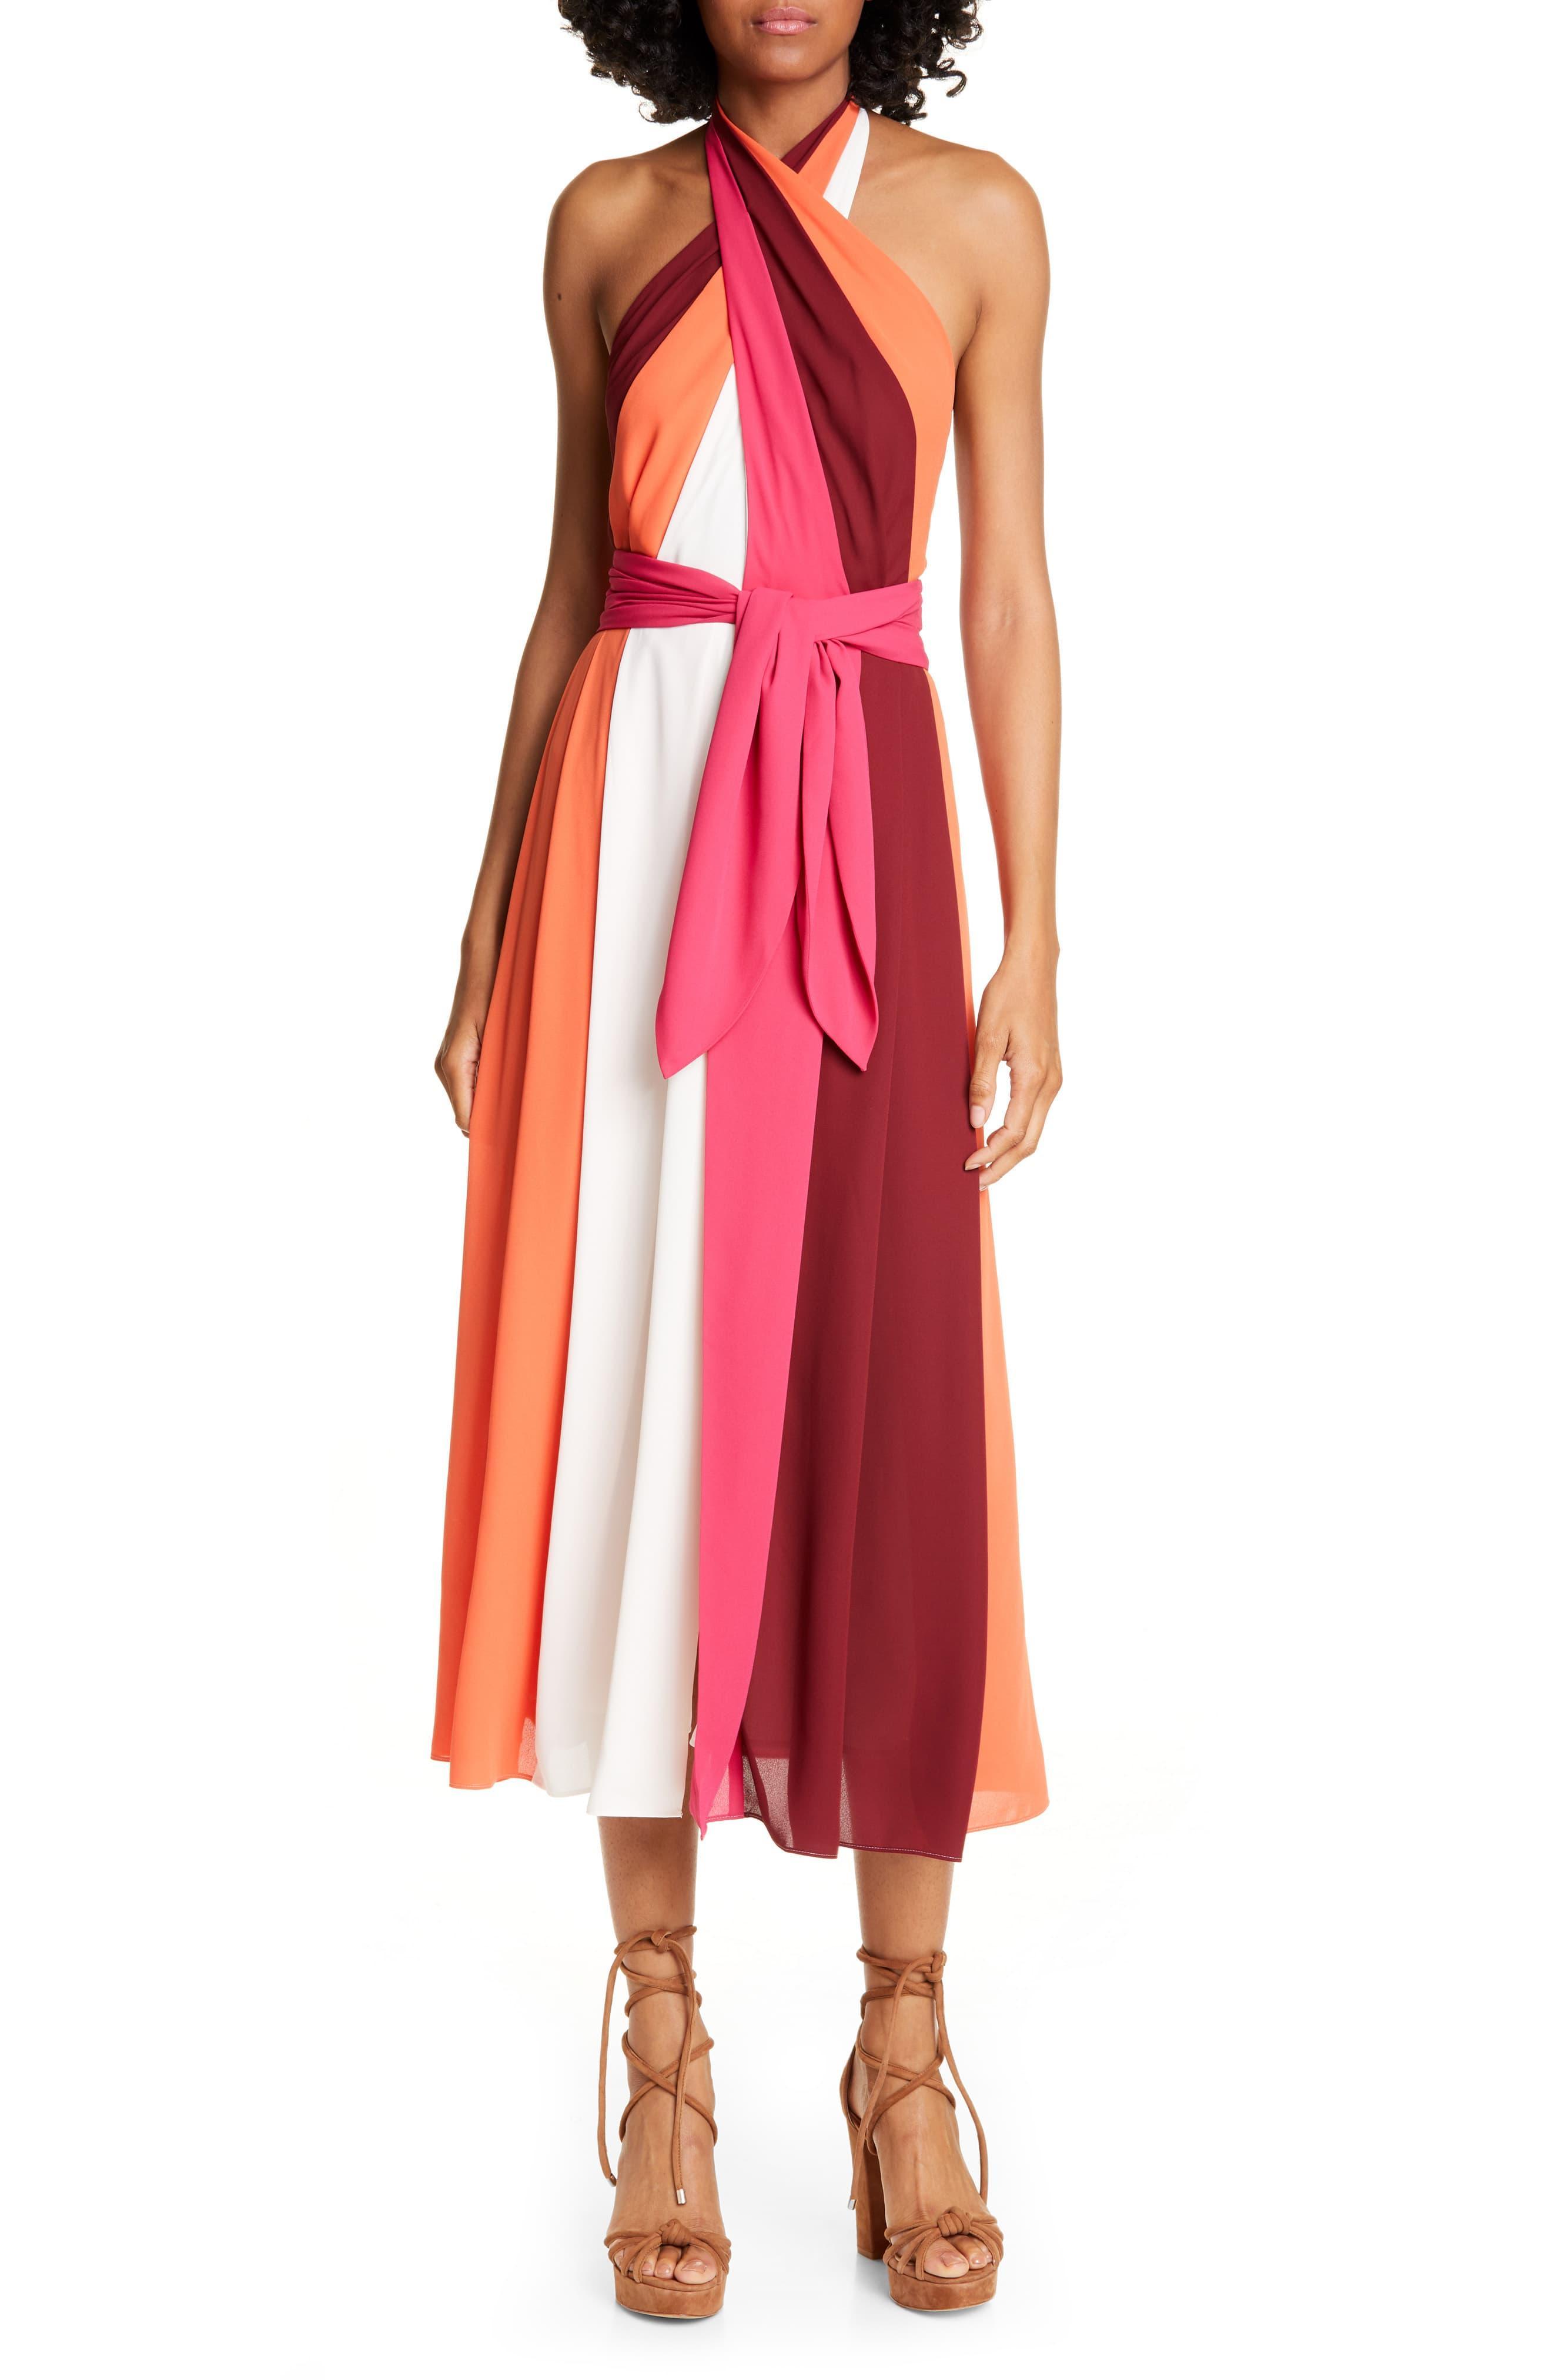 0a8d5f7c9052e5 Tommy Hilfiger. Women's Tommy X Zendaya Cross Front Midi Dress